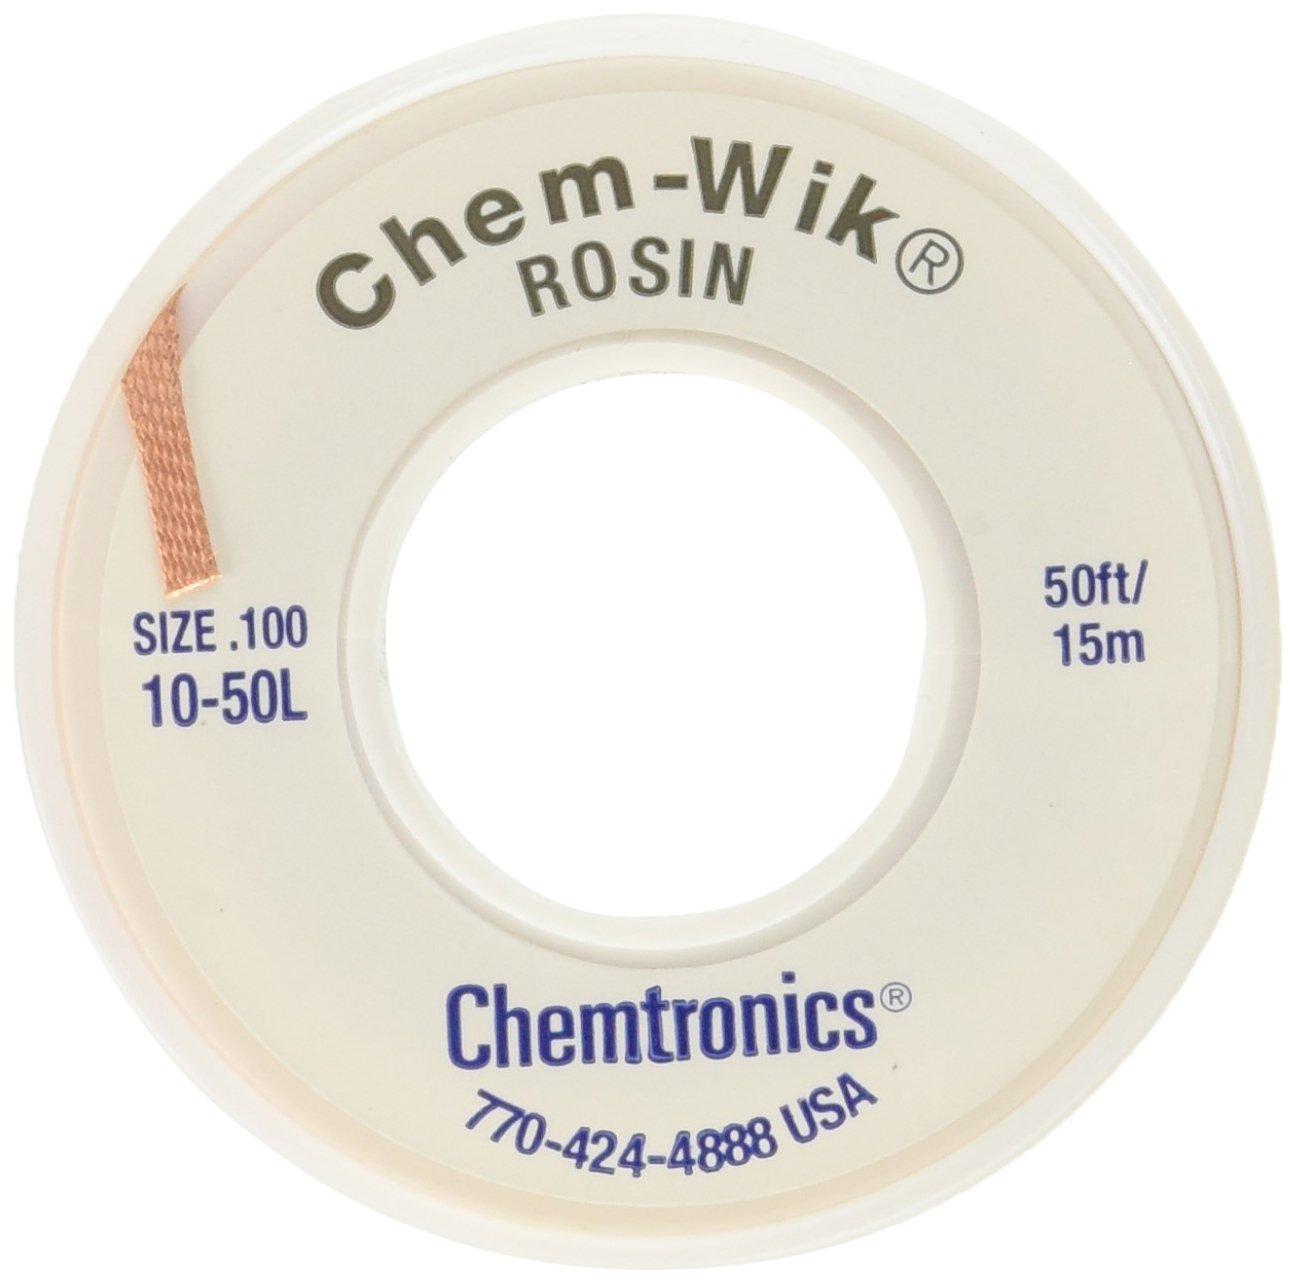 Chemtronics Desoldering Braid, Chem-Wik, Rosin, 10-50L 0.10'', 50ft.